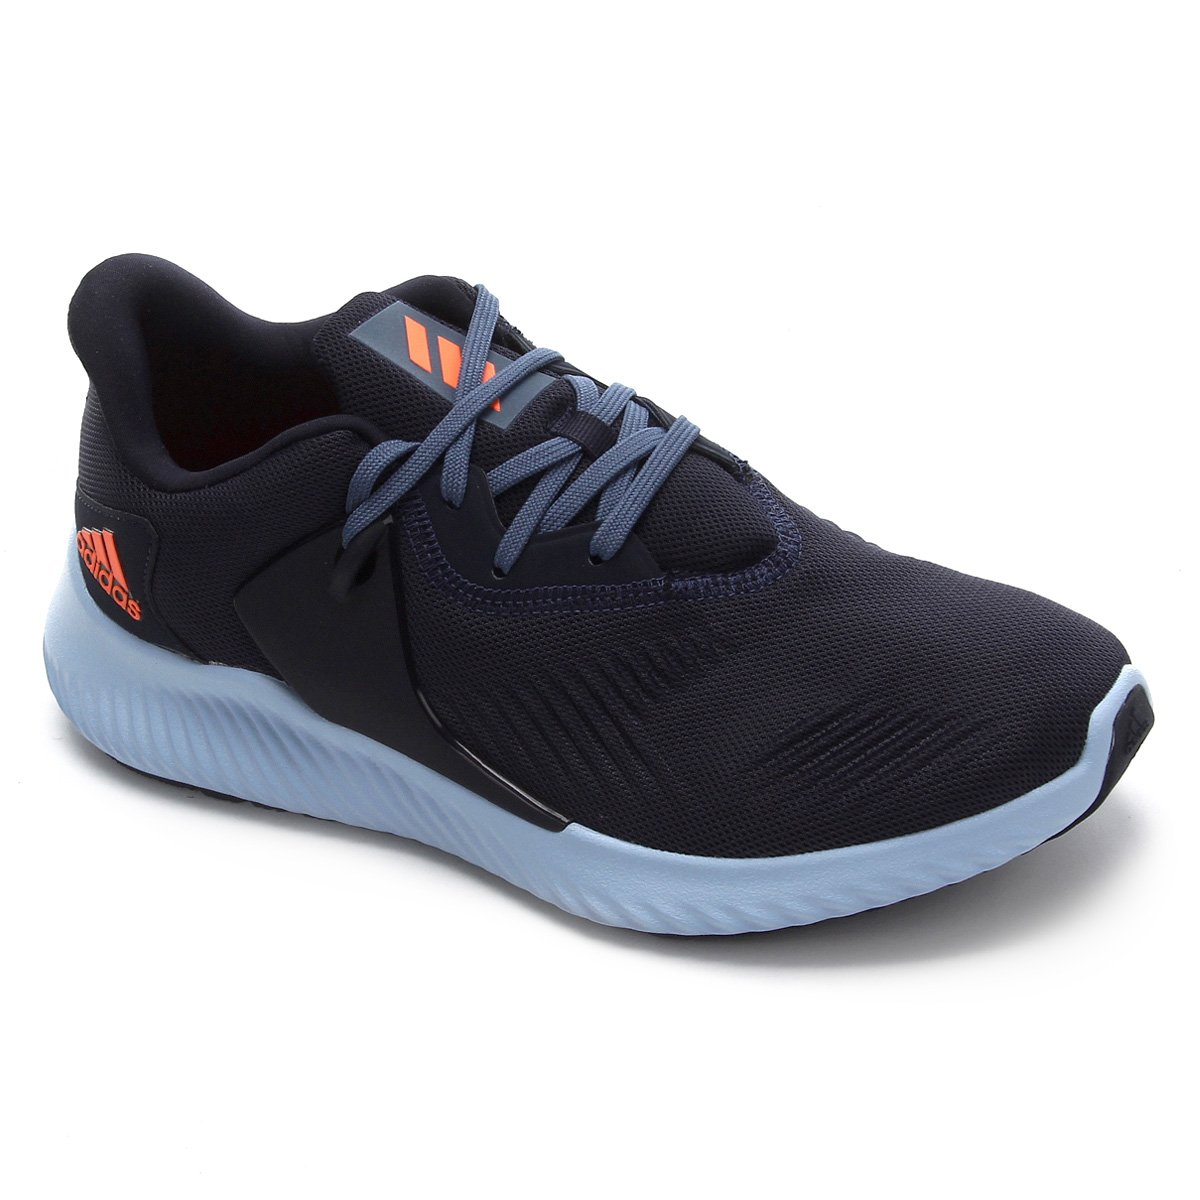 Tênis Adidas Alphabounce RC 2.0 Masculino - Marinho